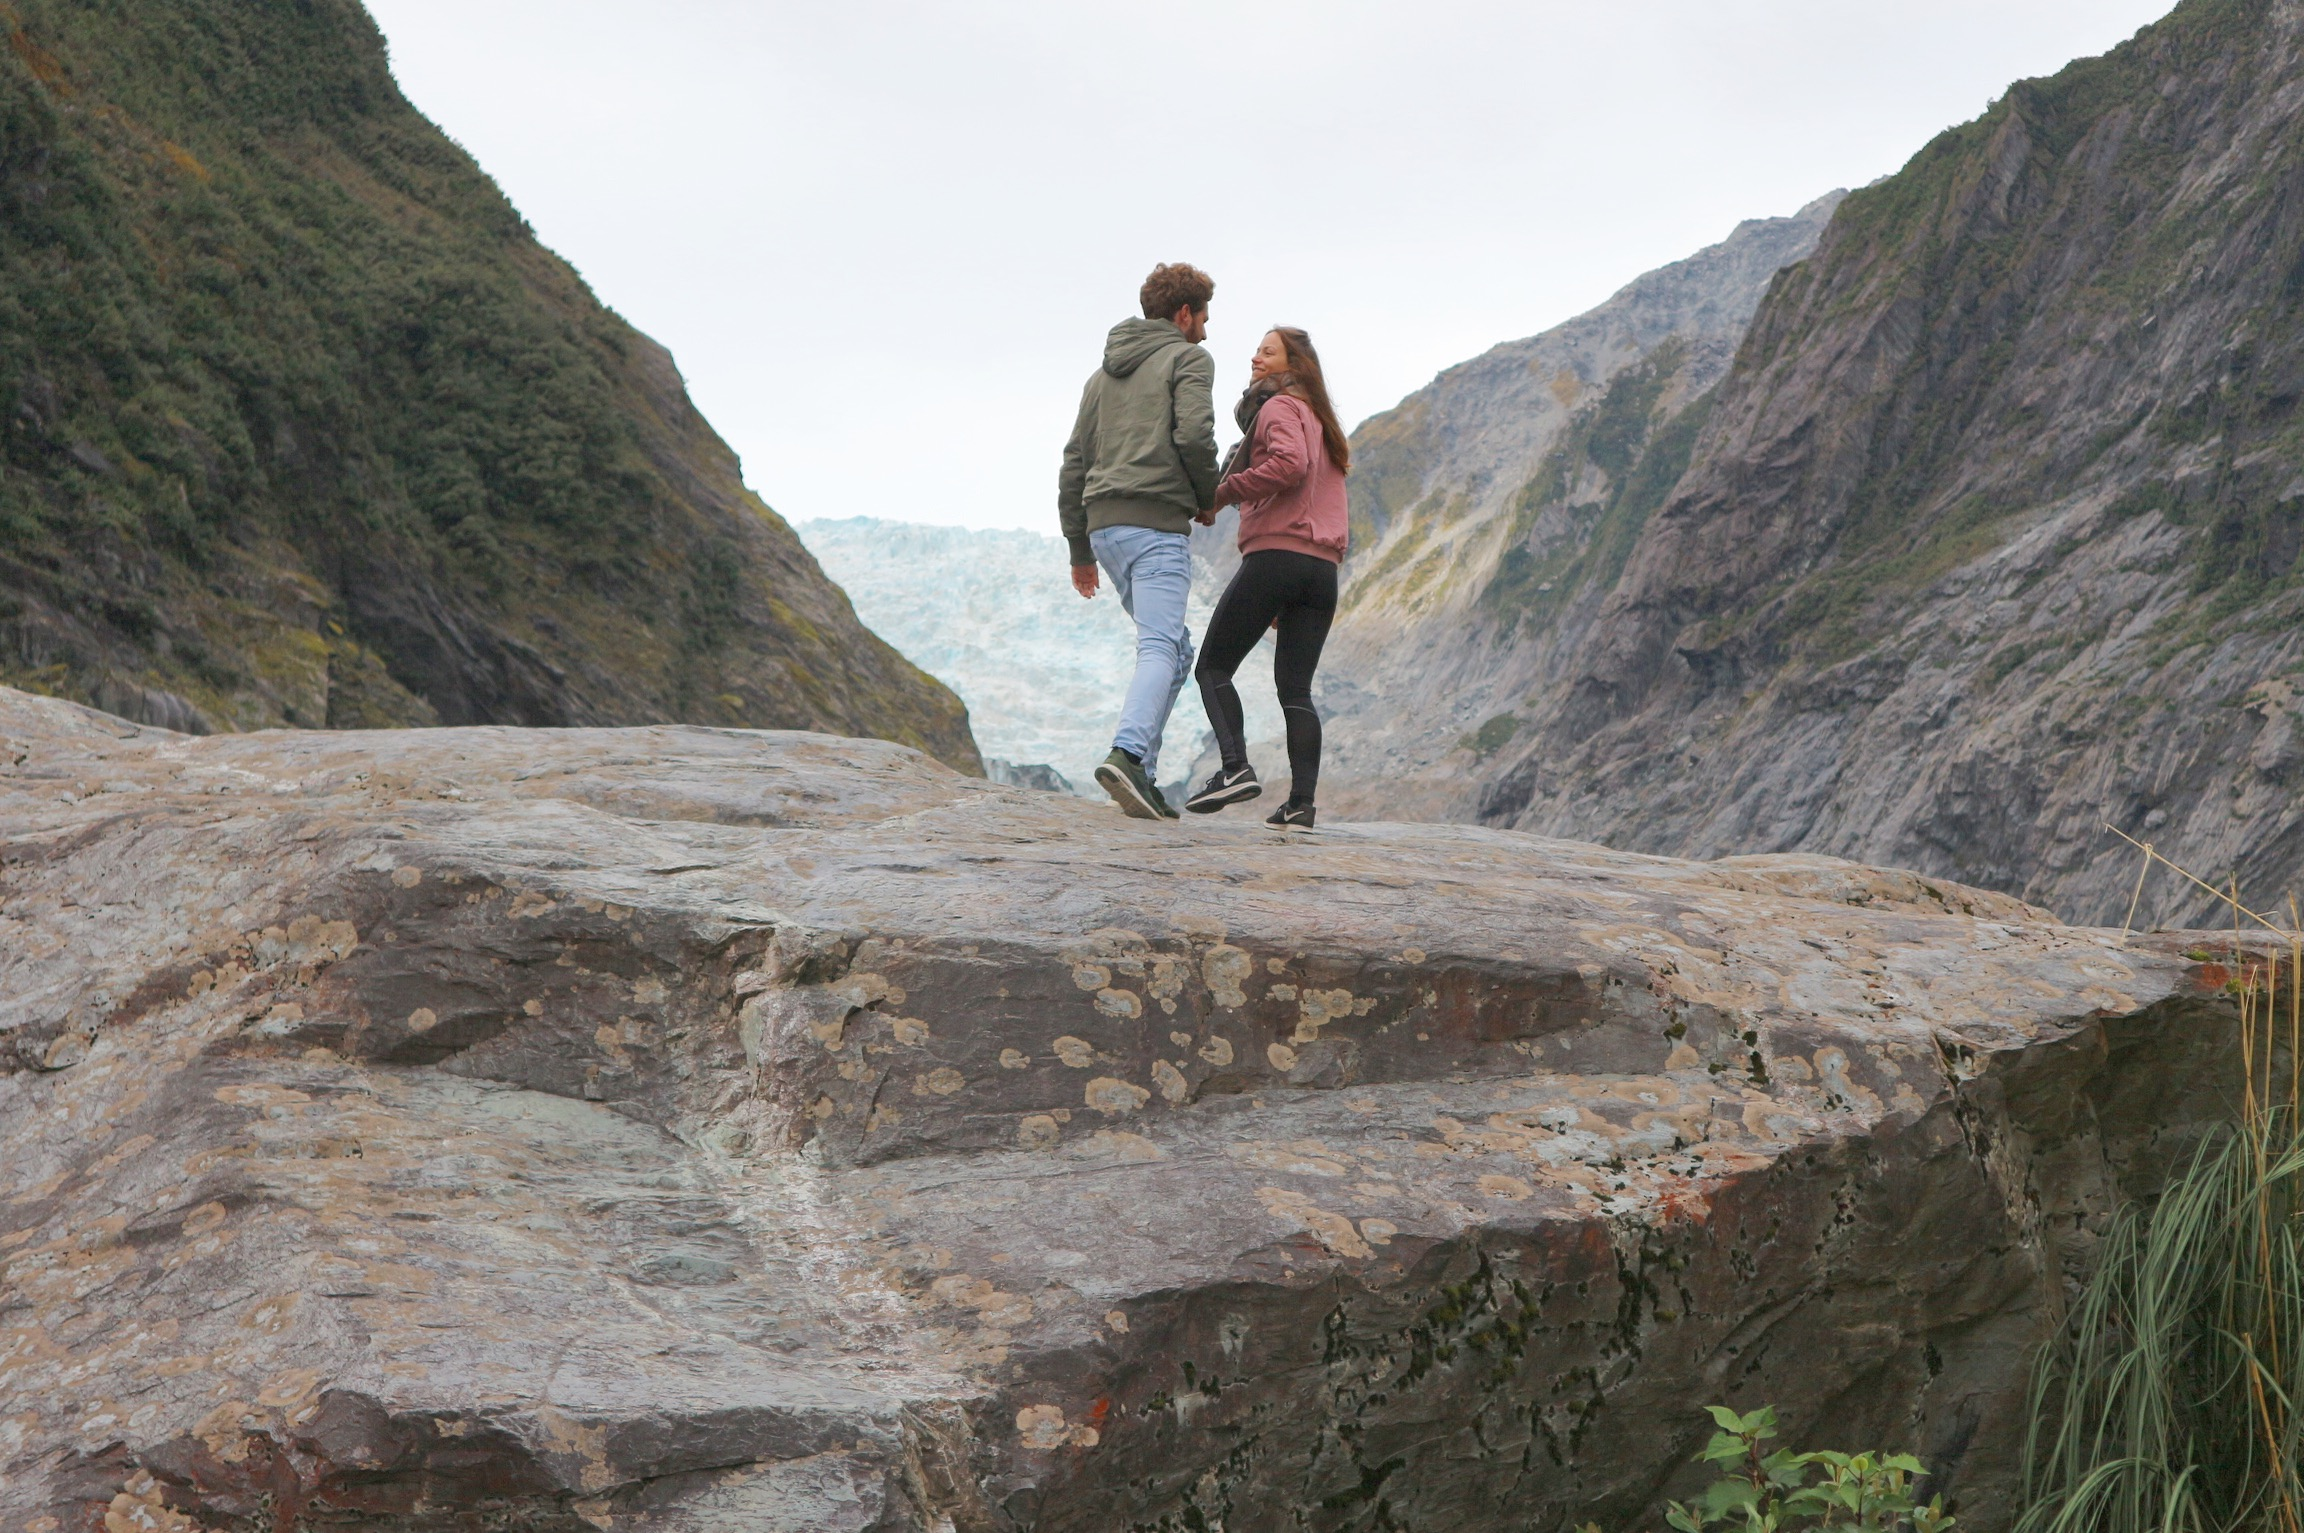 Wereldreis, reizen, Nieuw-Zeeland, backpack, backpacken, wanderlust, blog, blogger, gletsjer, westland